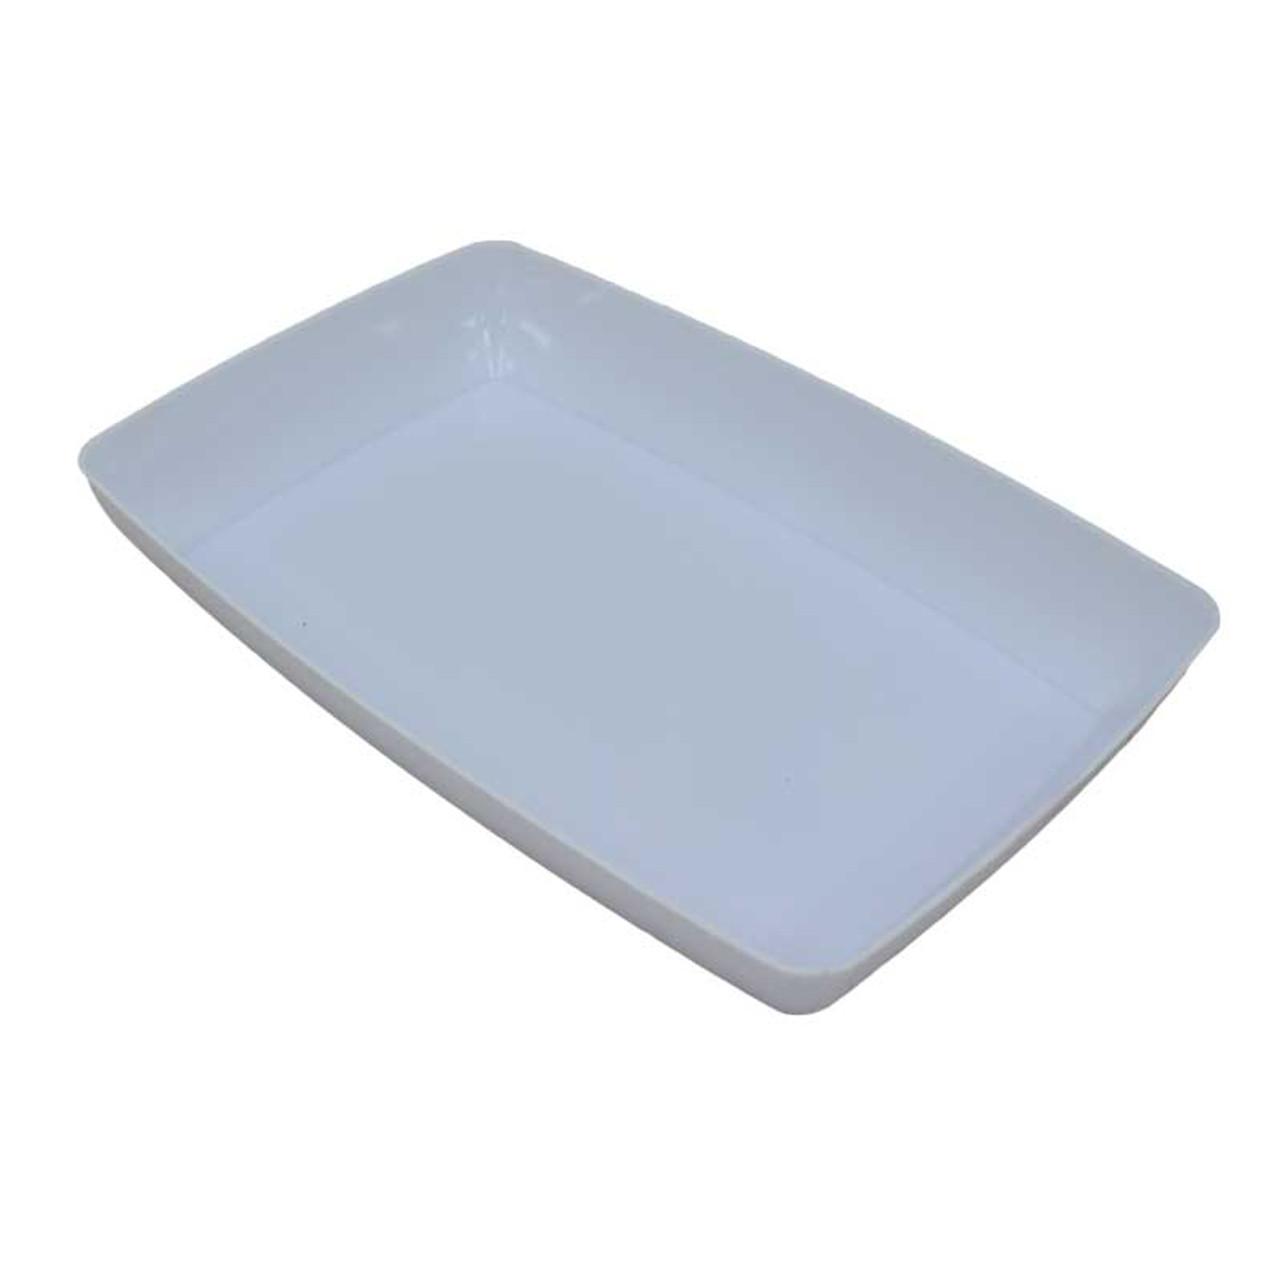 plastic storage parts tray organizer 6 x 4 inches